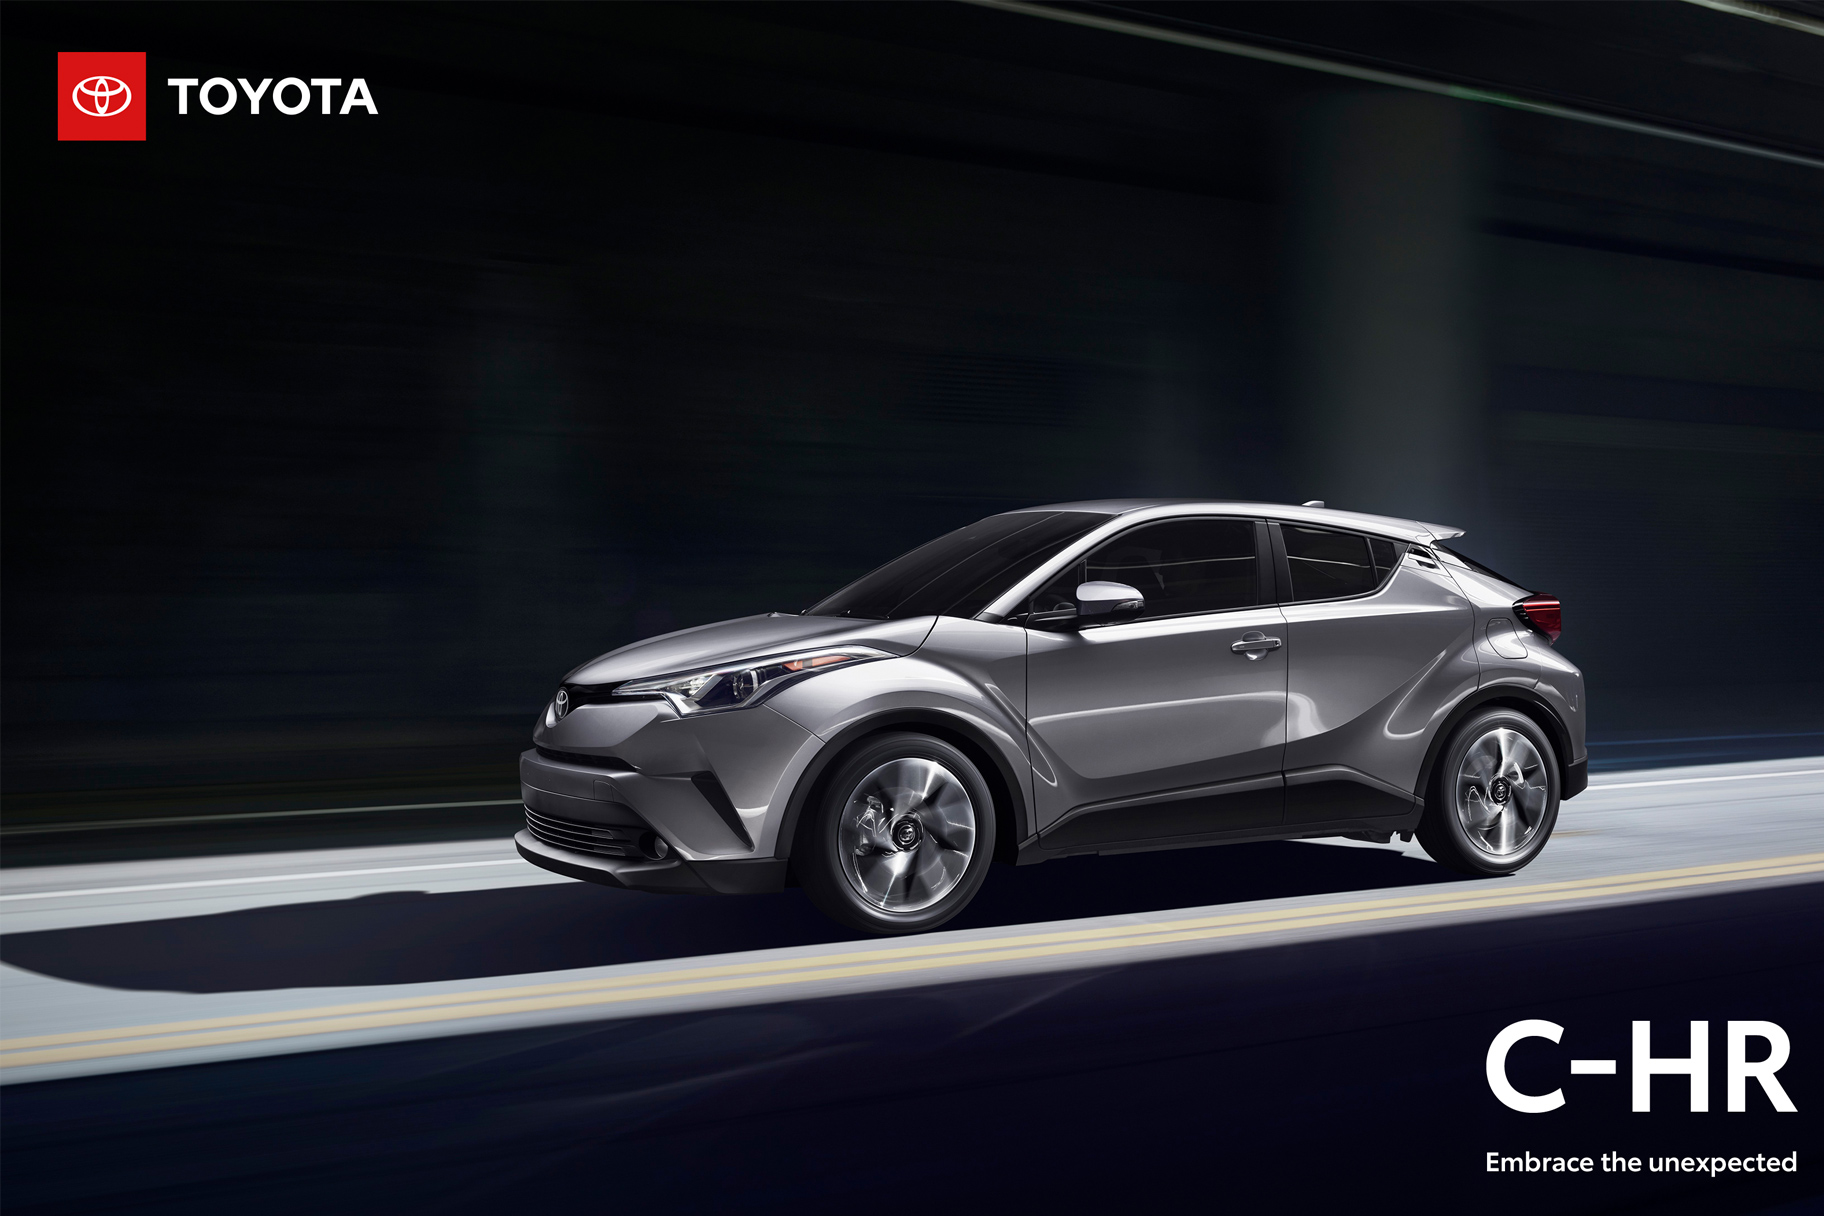 Nowe logo Toyoty 2019 - rebranding